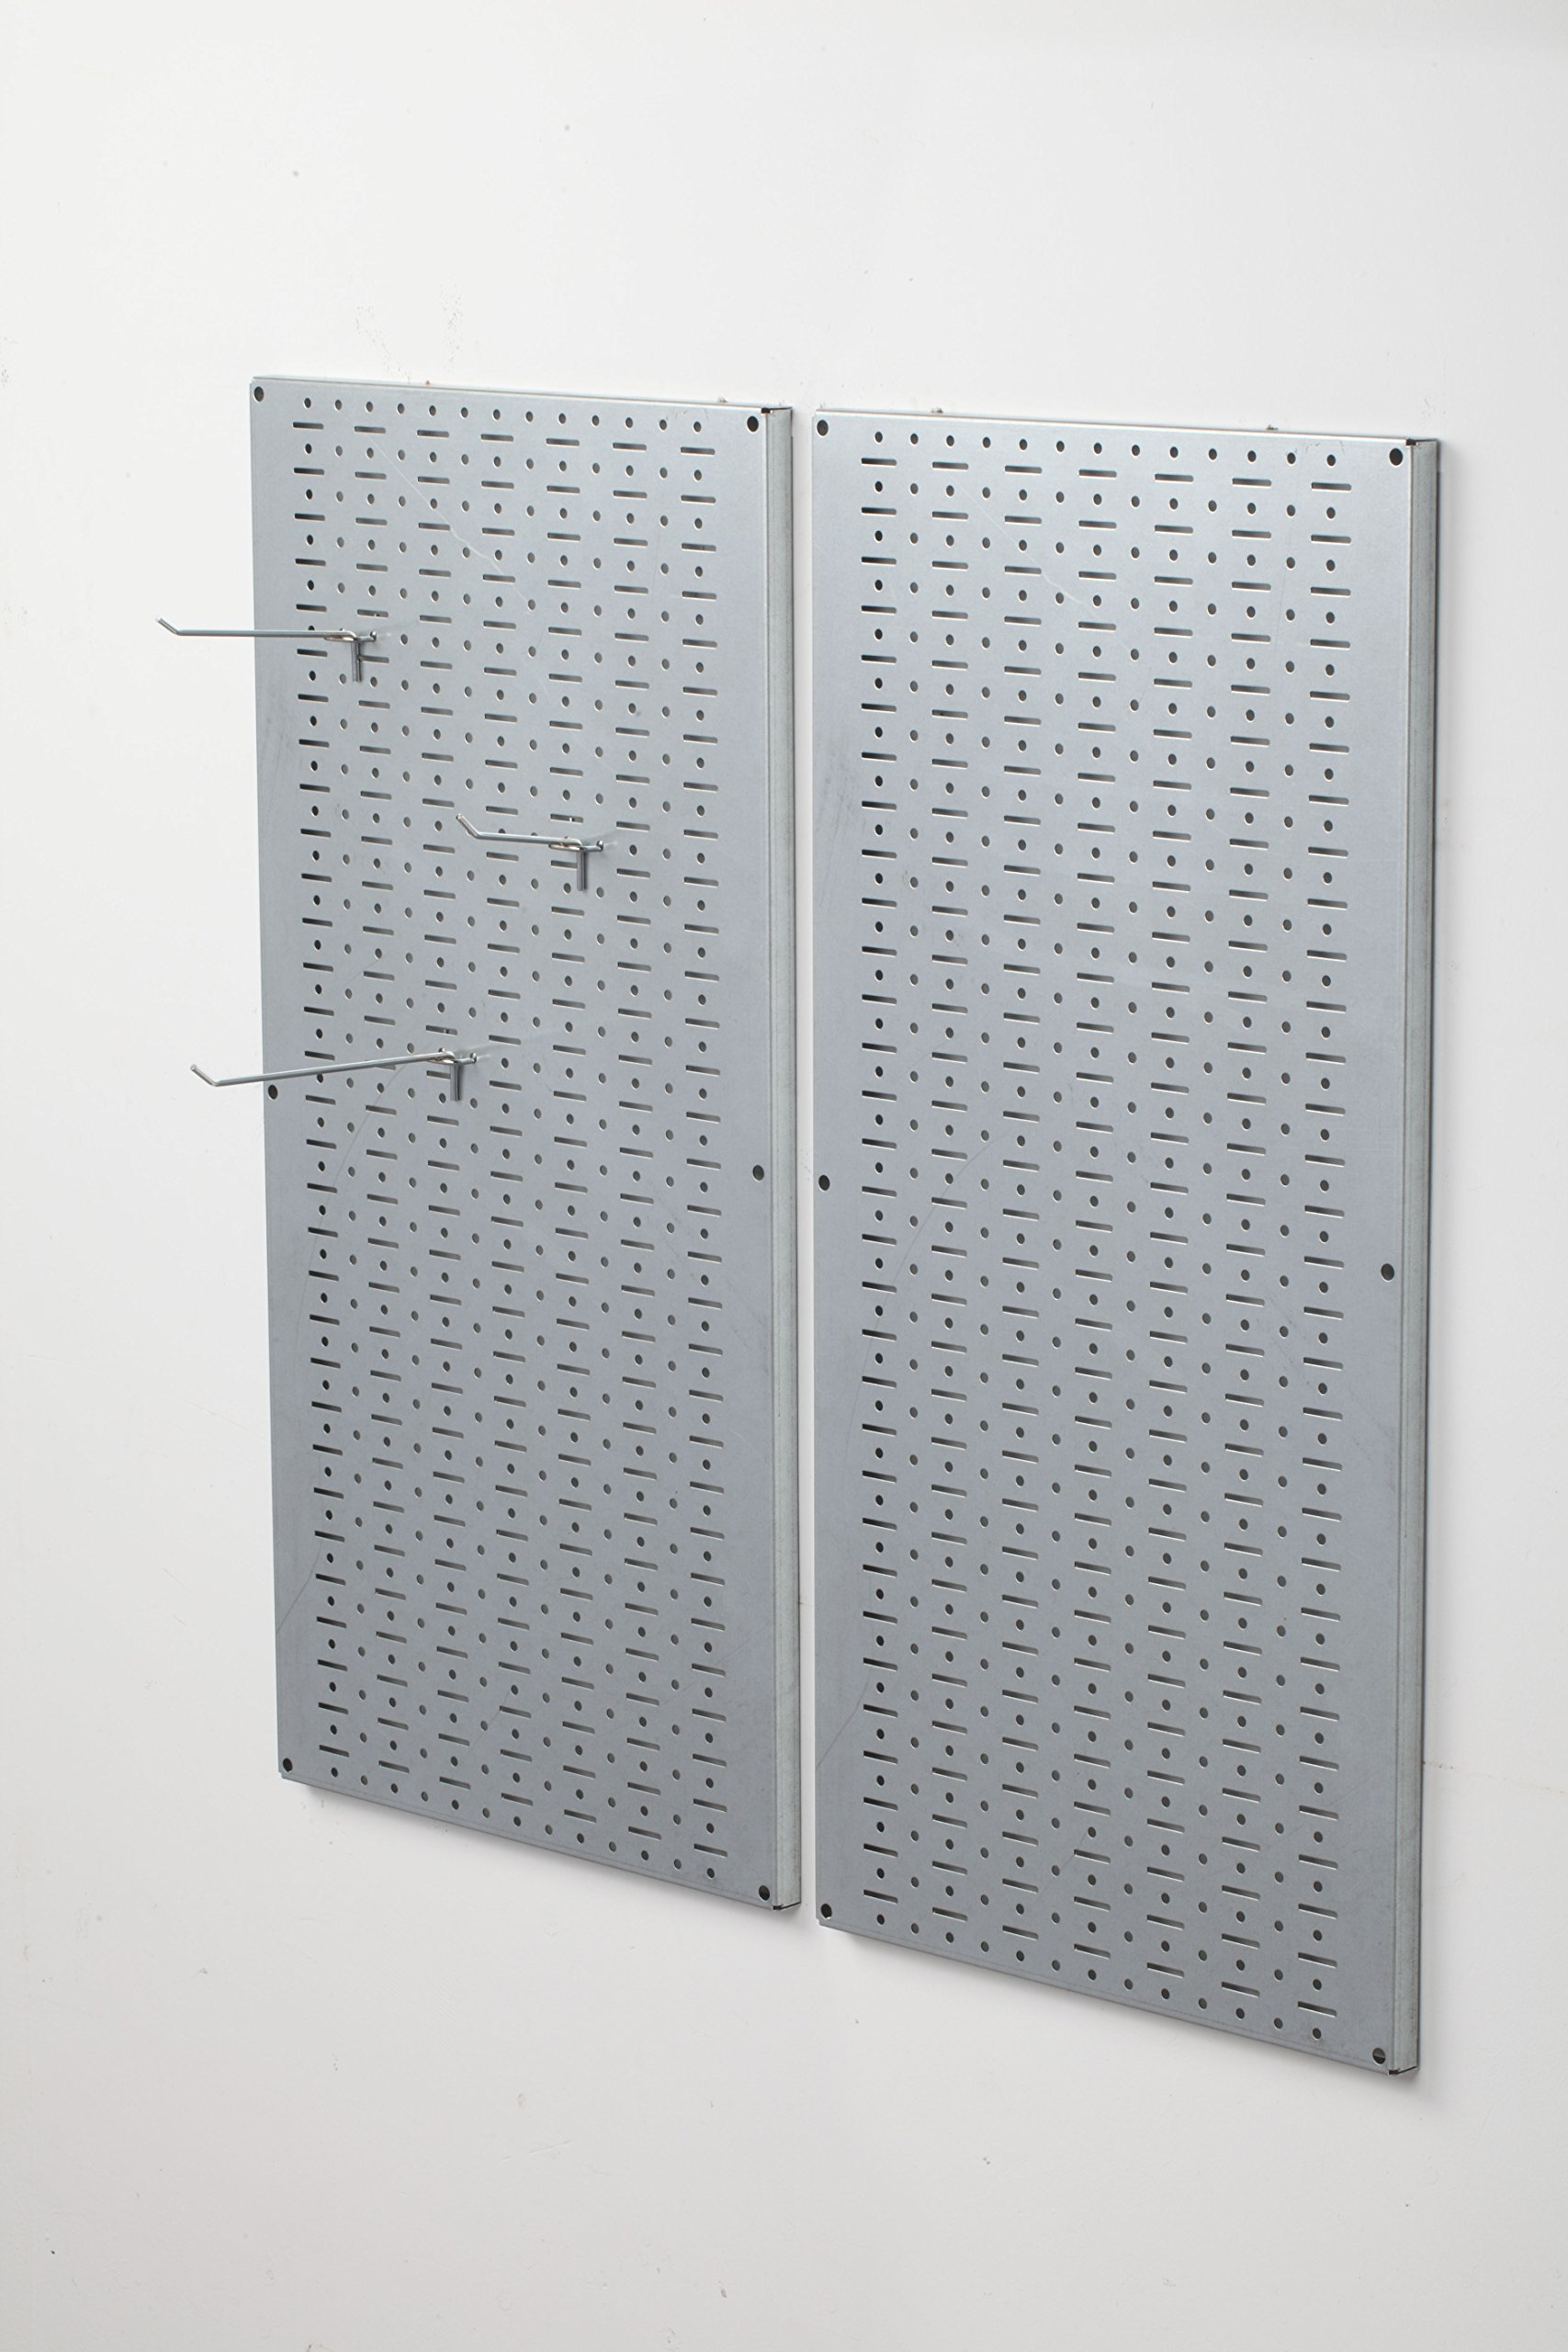 Muscle Rack GPB2 Galvanized Steel Pegboard Pack, 32'' Height, 16'' Width, 1'' Length by Muscle Rack (Image #1)